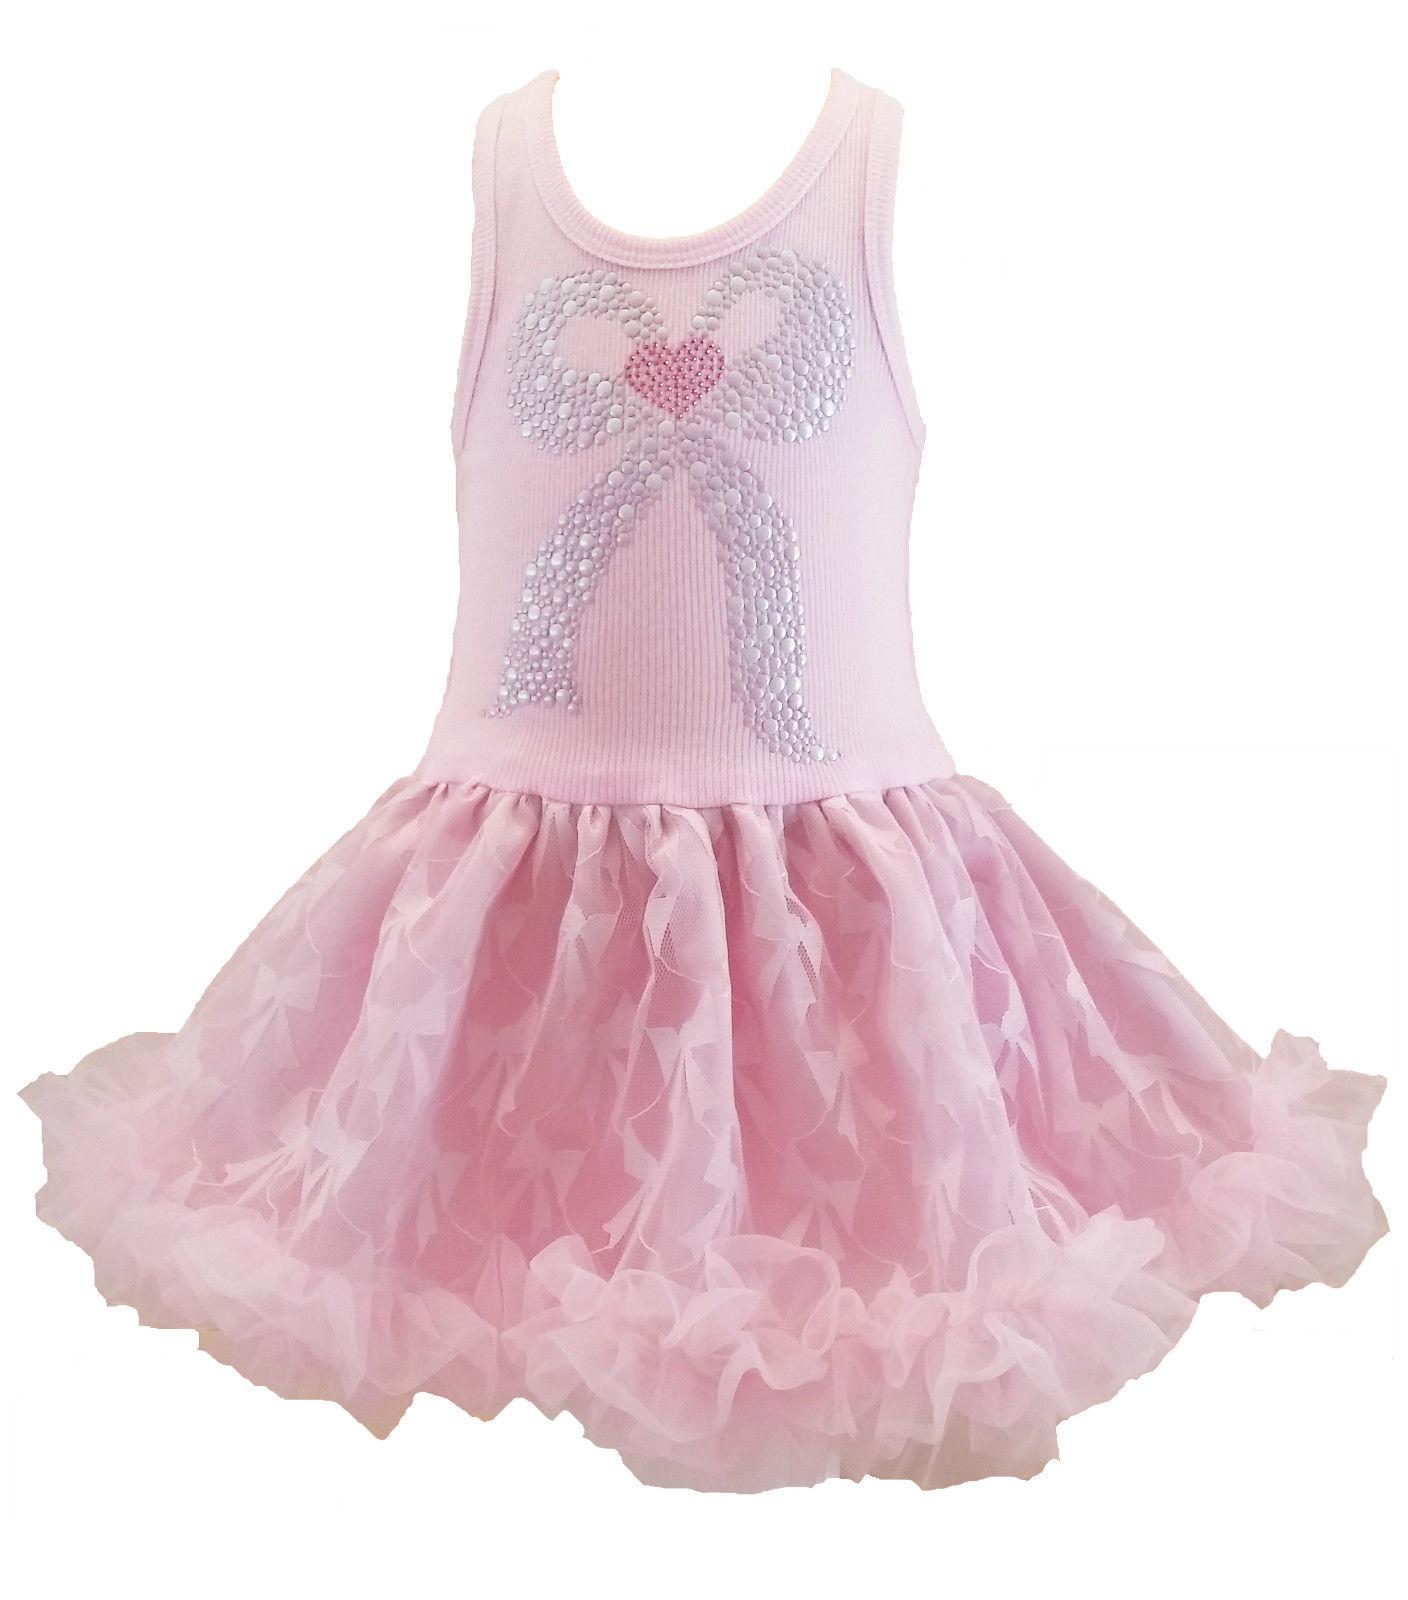 Image 1 of Sweet Pink Misty Bow Chiffon Sleeveless Tutu Dress, 3-6x USA, Cupcakes & Kisses